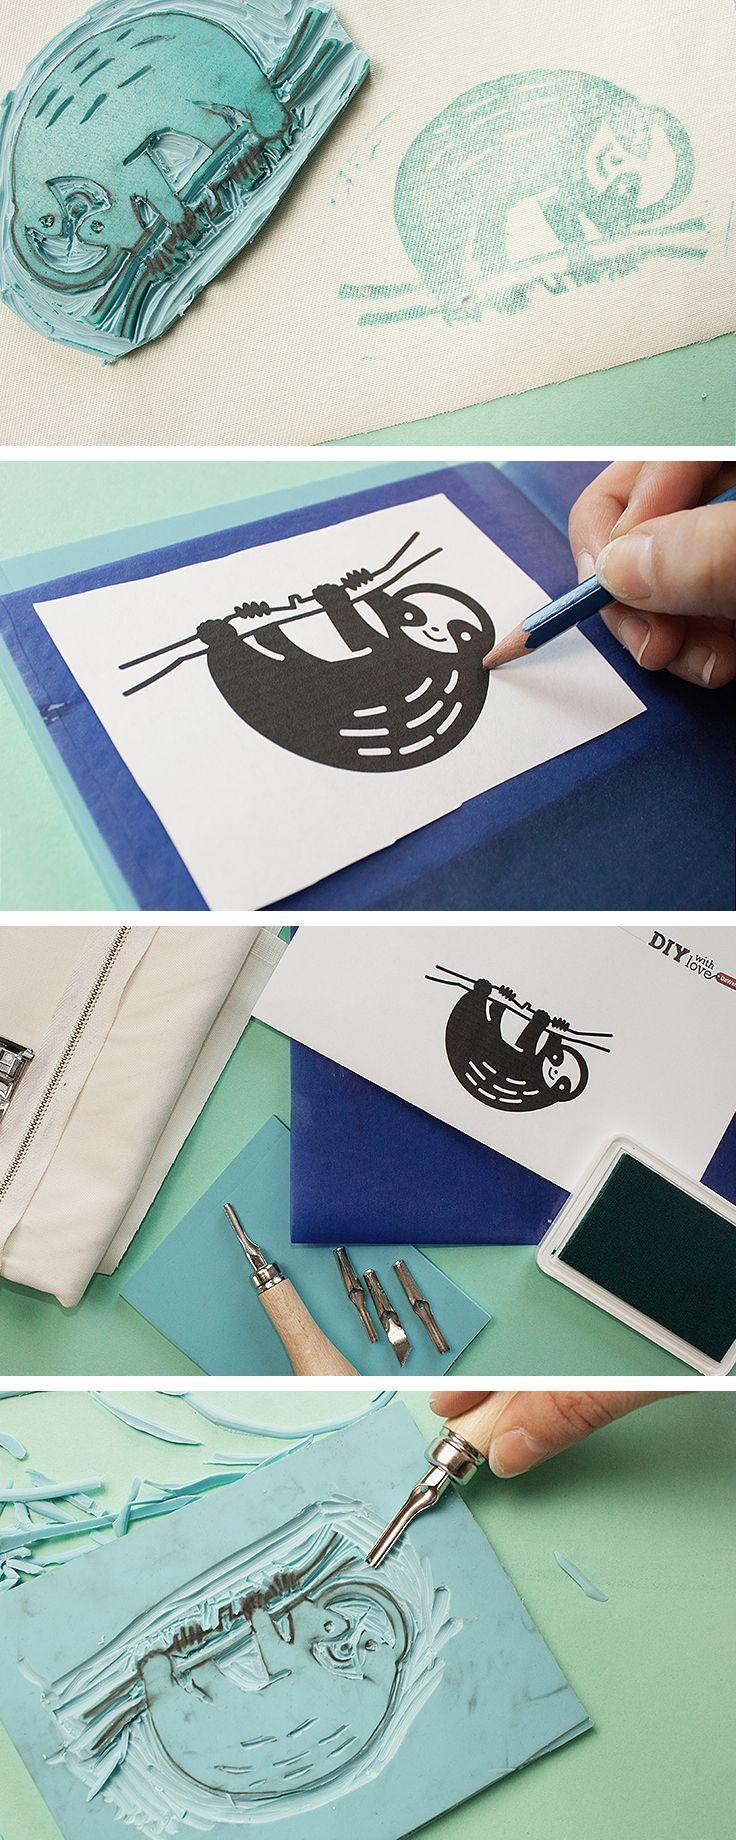 DIY tutorial: Sew a Hand-Stamped Sloth Pouch  via en.DaWanda.com